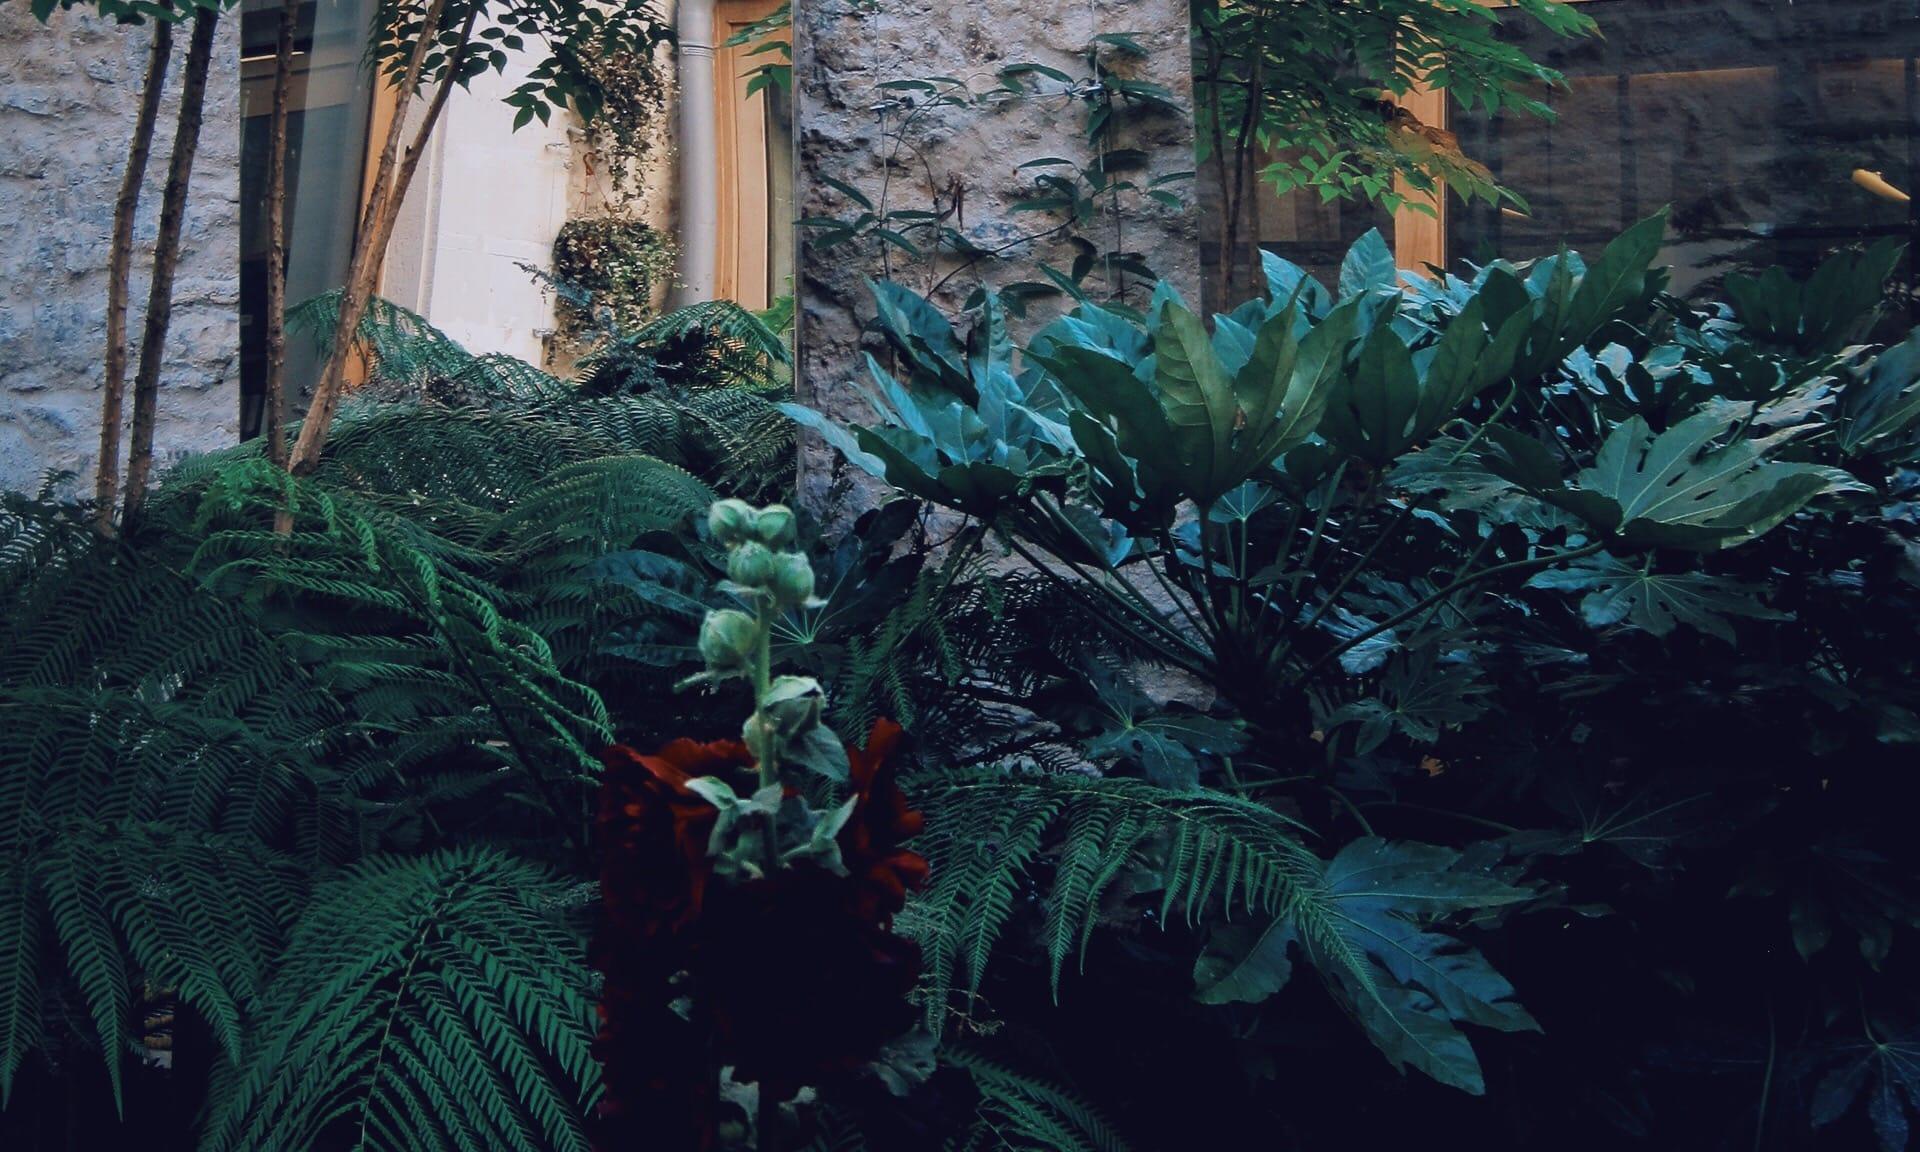 07_Nordscape_Patio-jardin-fougeres-miroirs